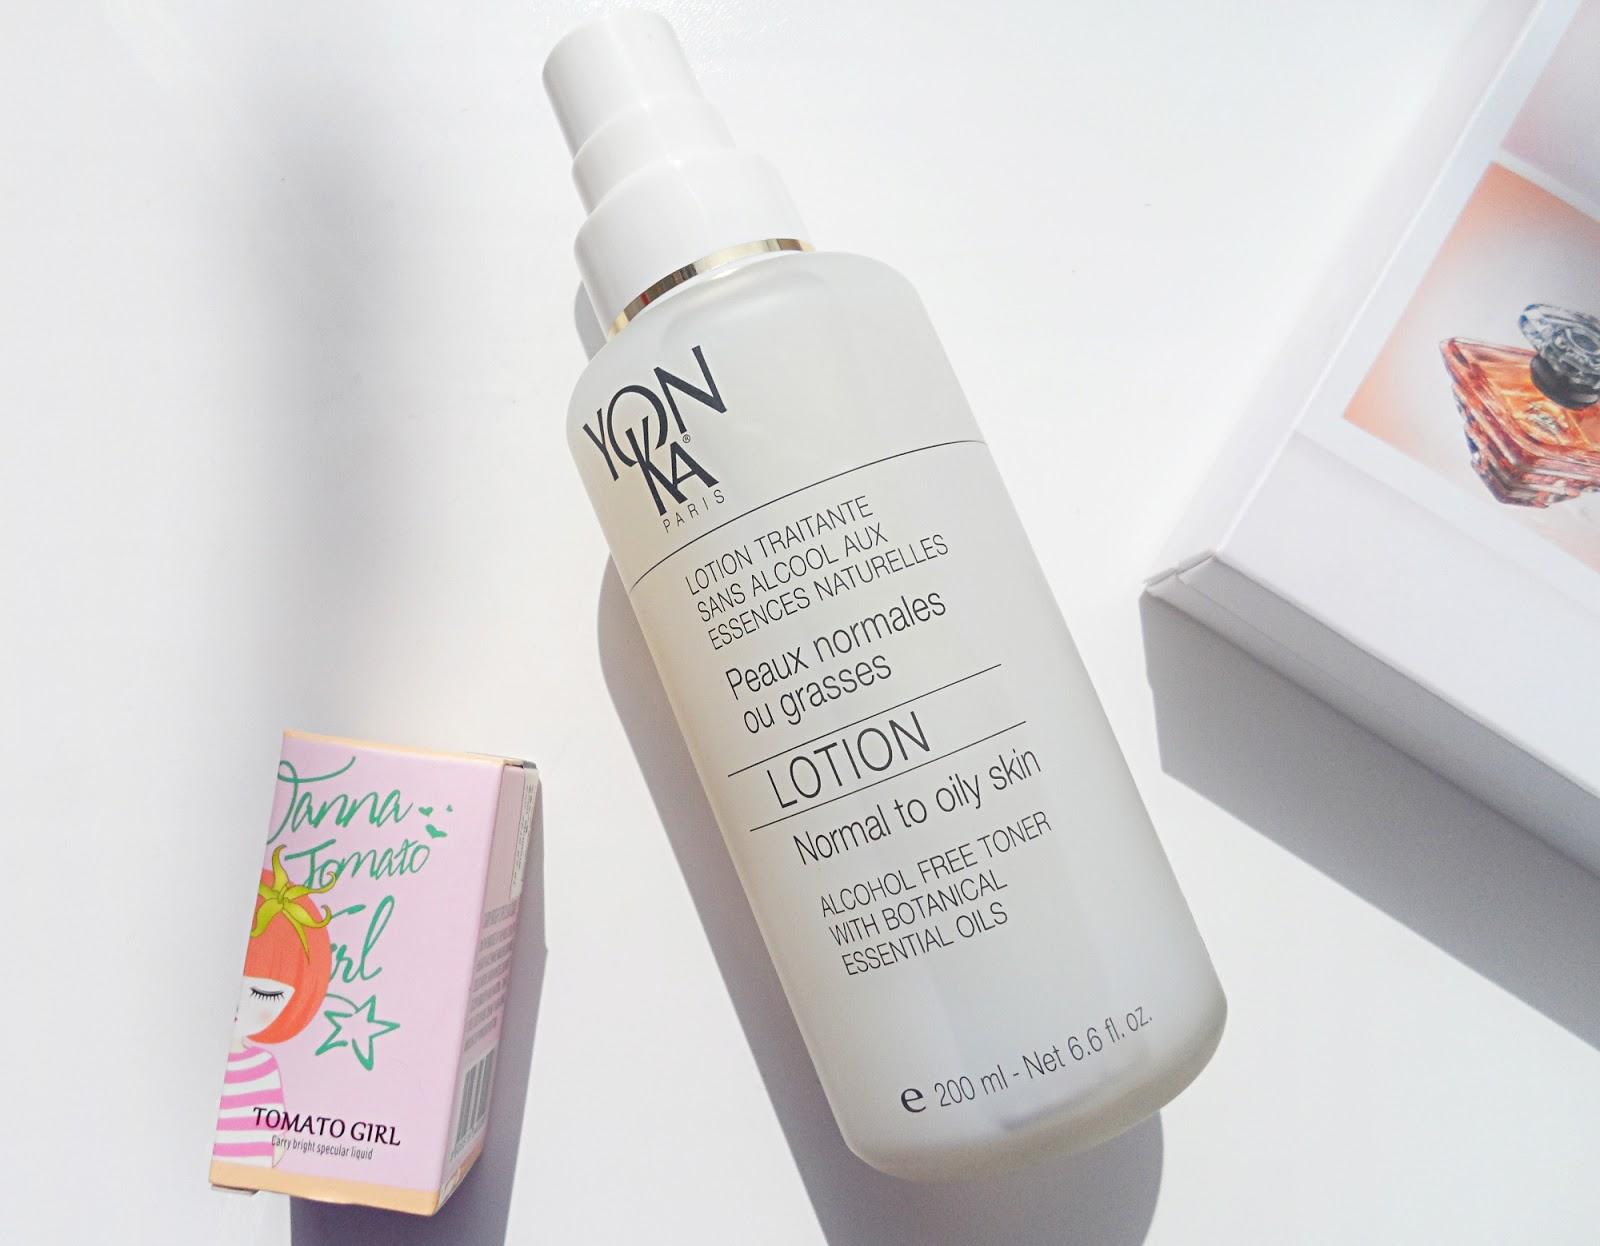 yonka yon ka aromatic phyto facial spray mist spa therapy buy online review liz breygel blogger